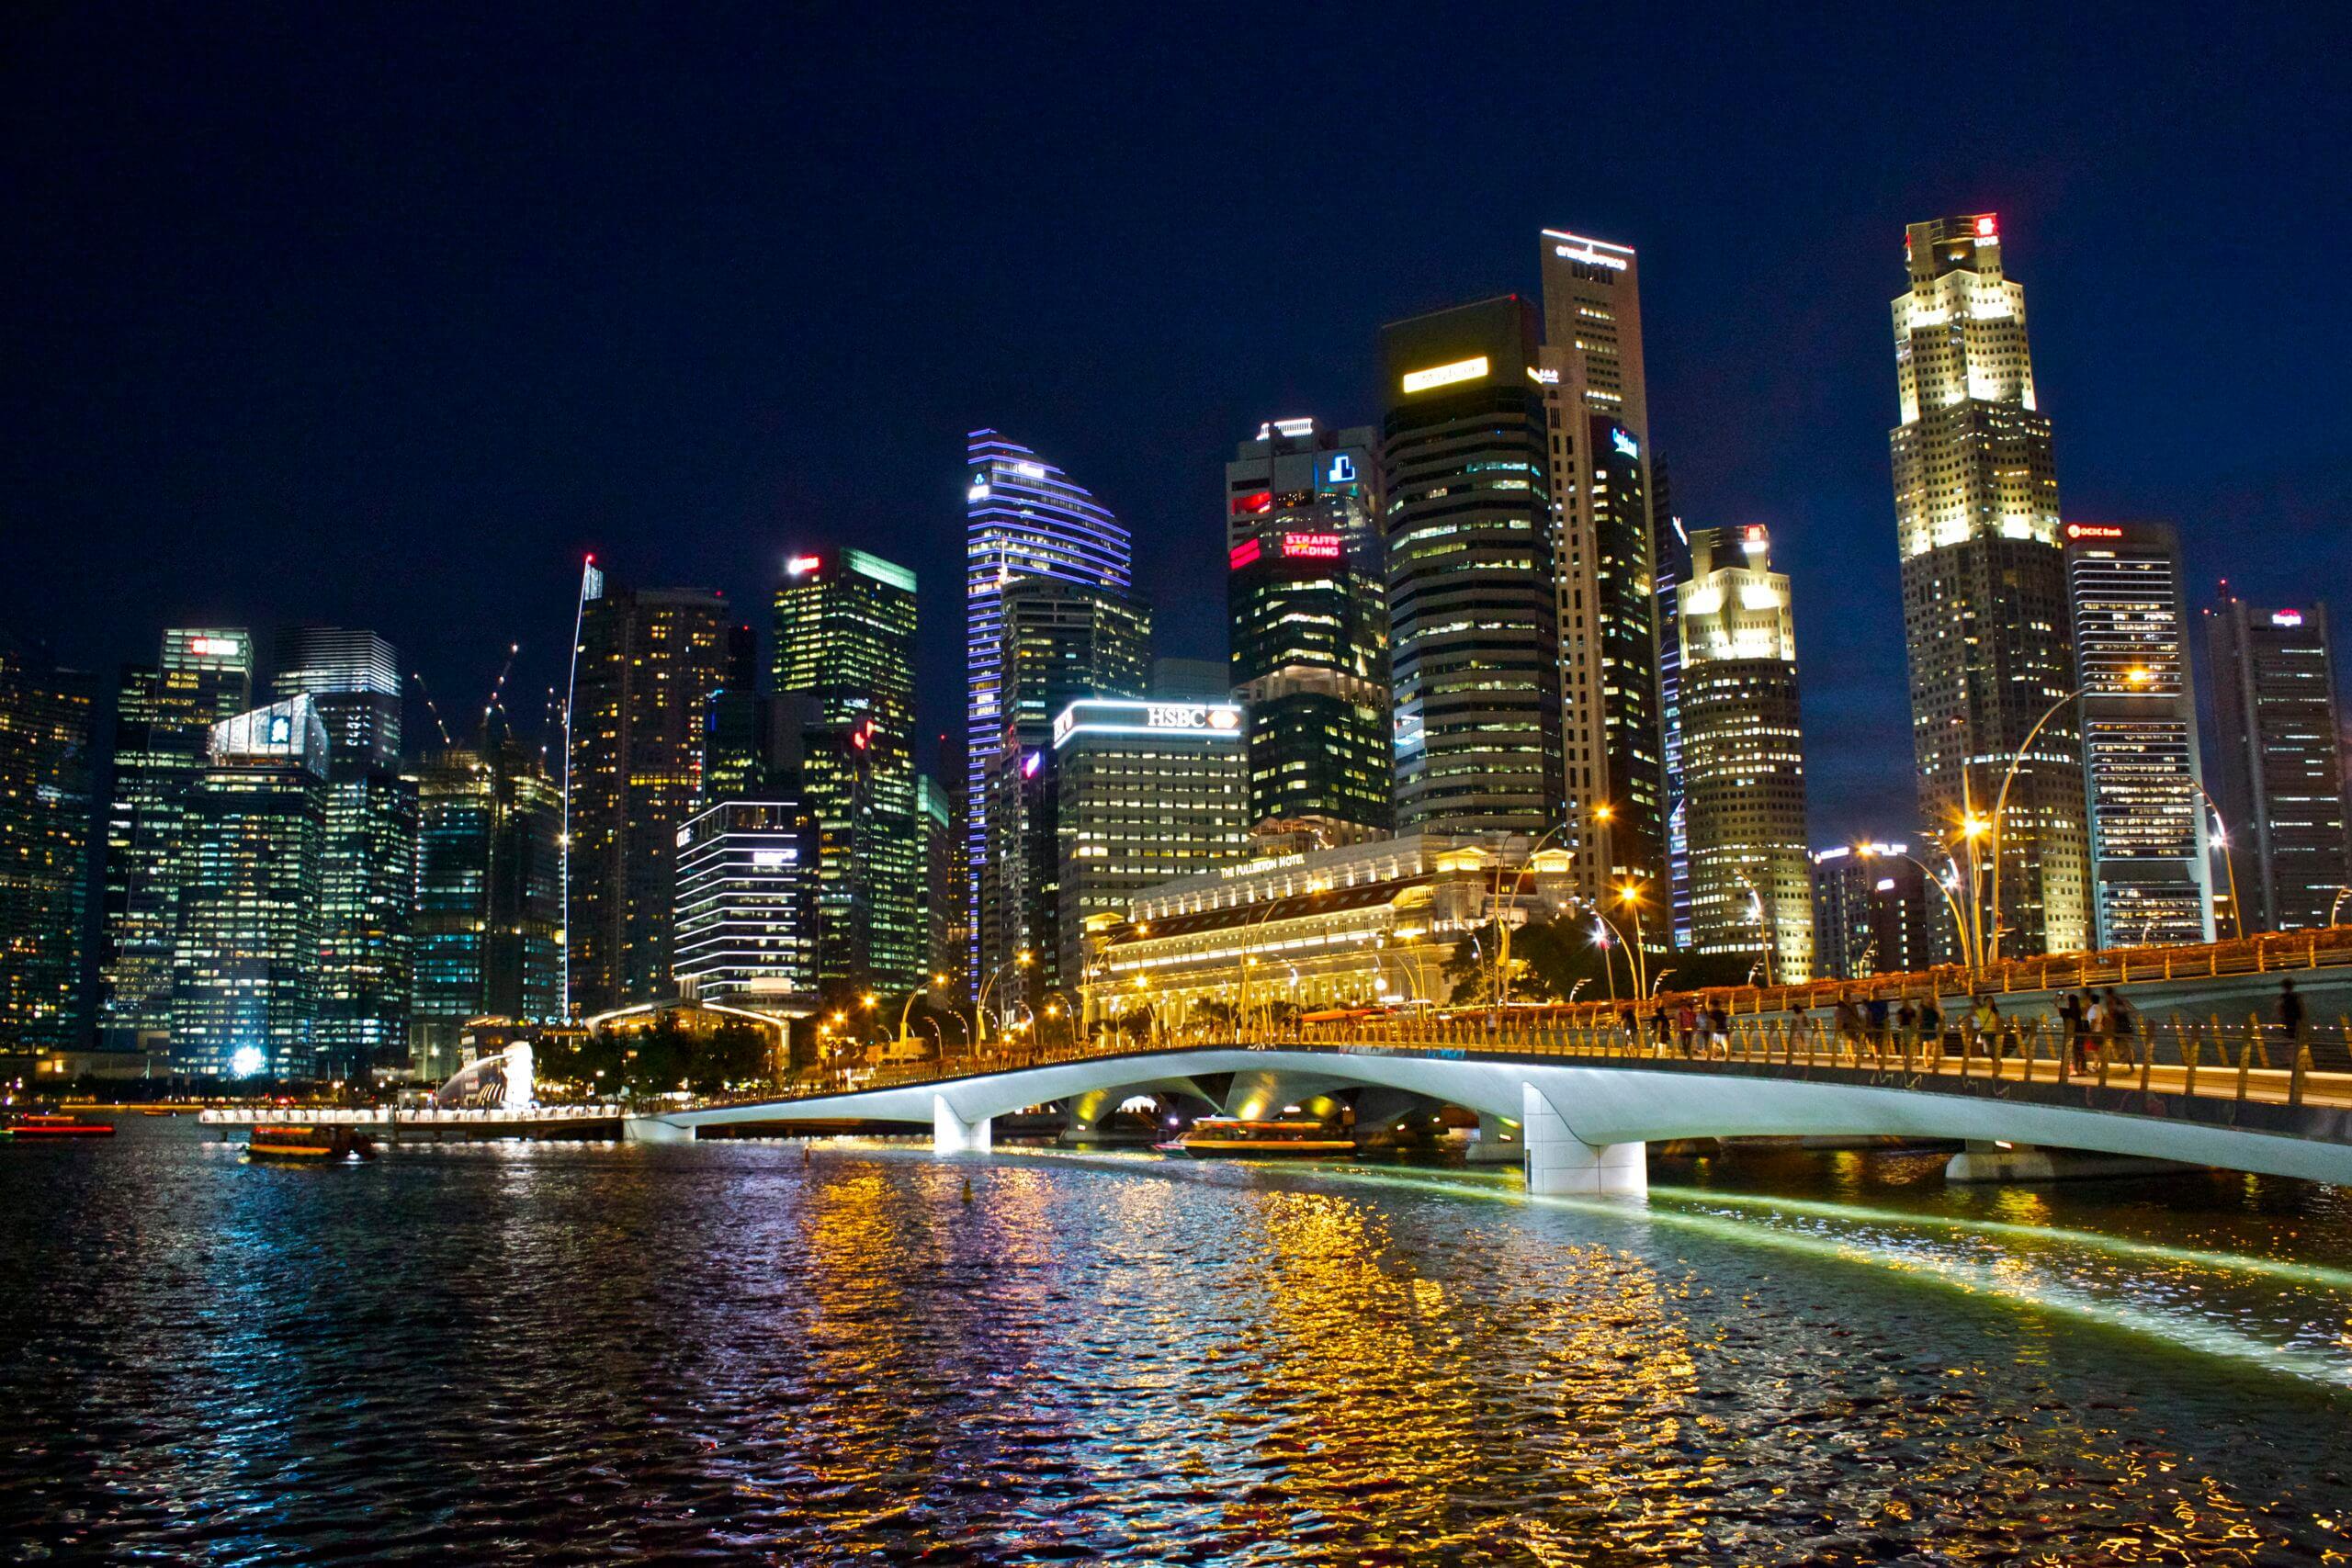 City. Singapur